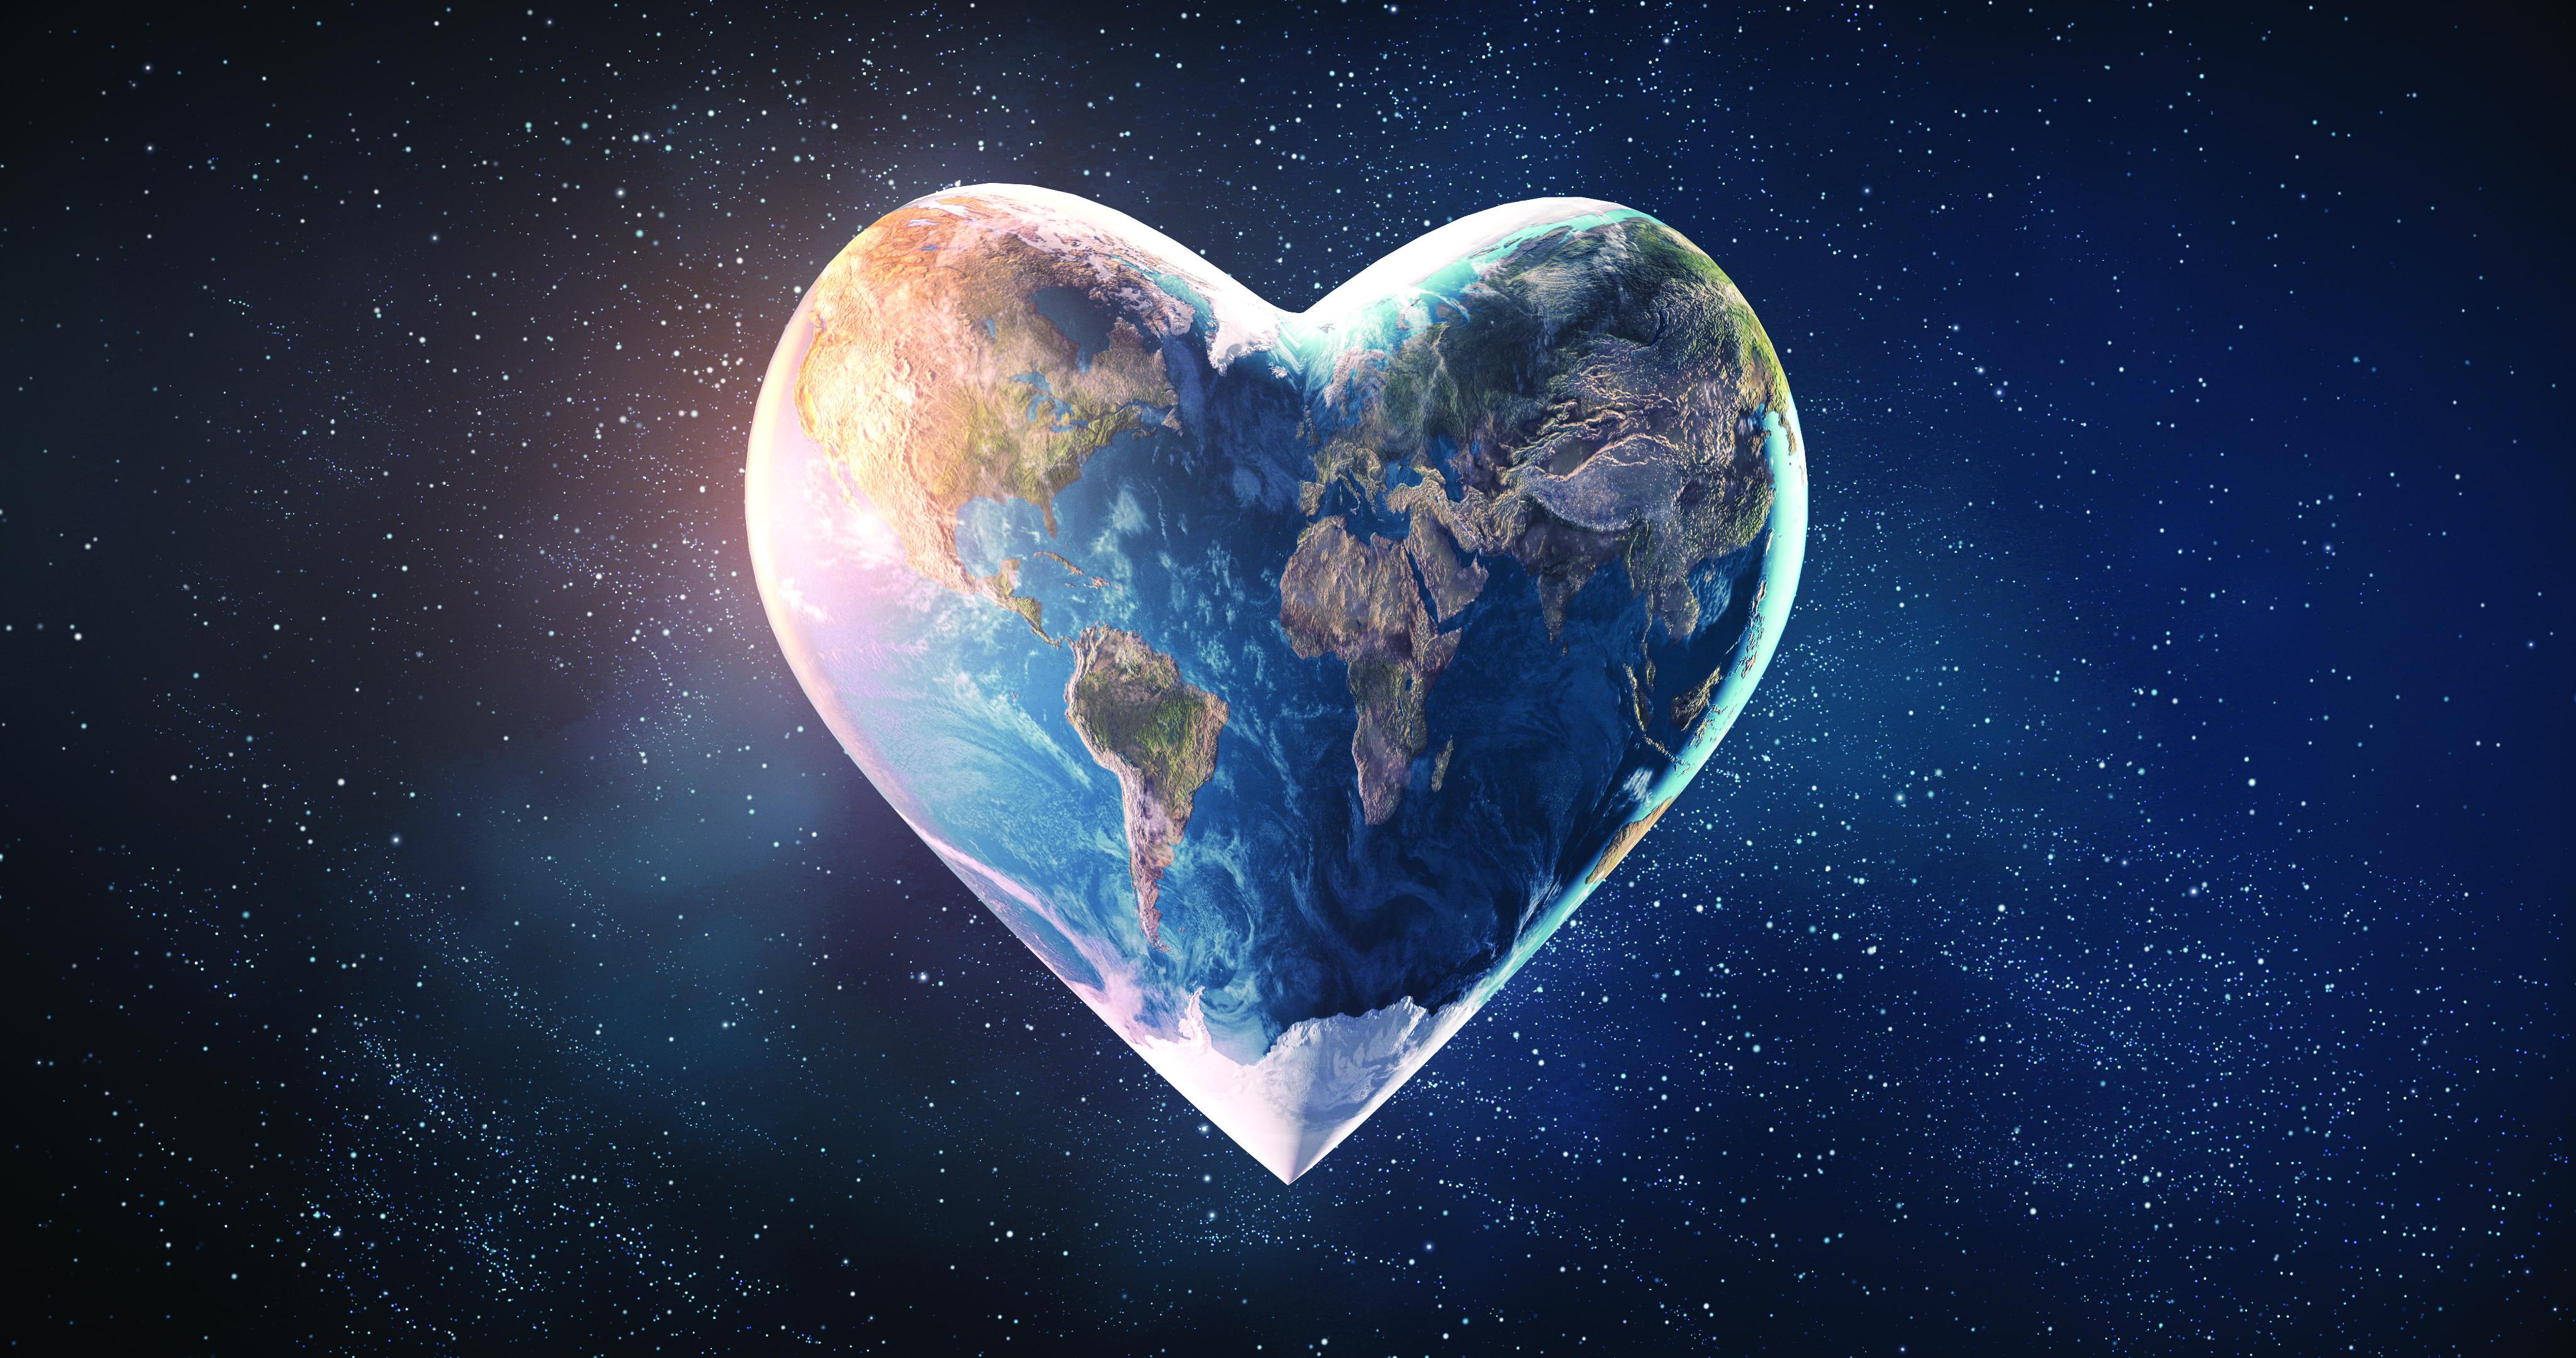 TW1021_heart-shaped-earth.jpg